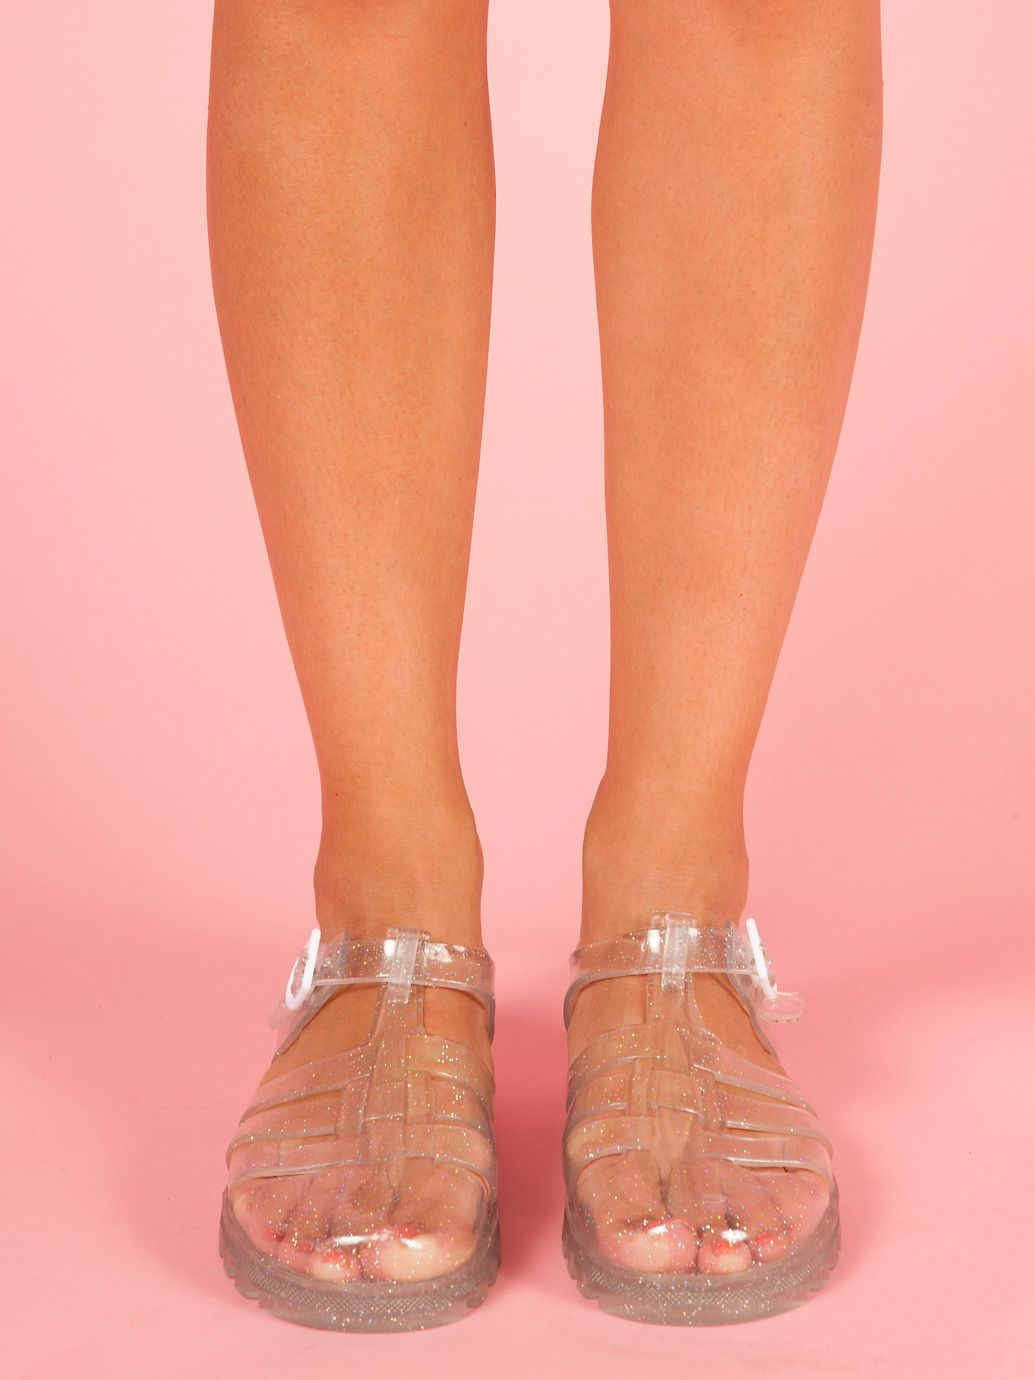 df9a9e684c7 American Apparel - Juju Maxi Jelly Sandals. When not at work